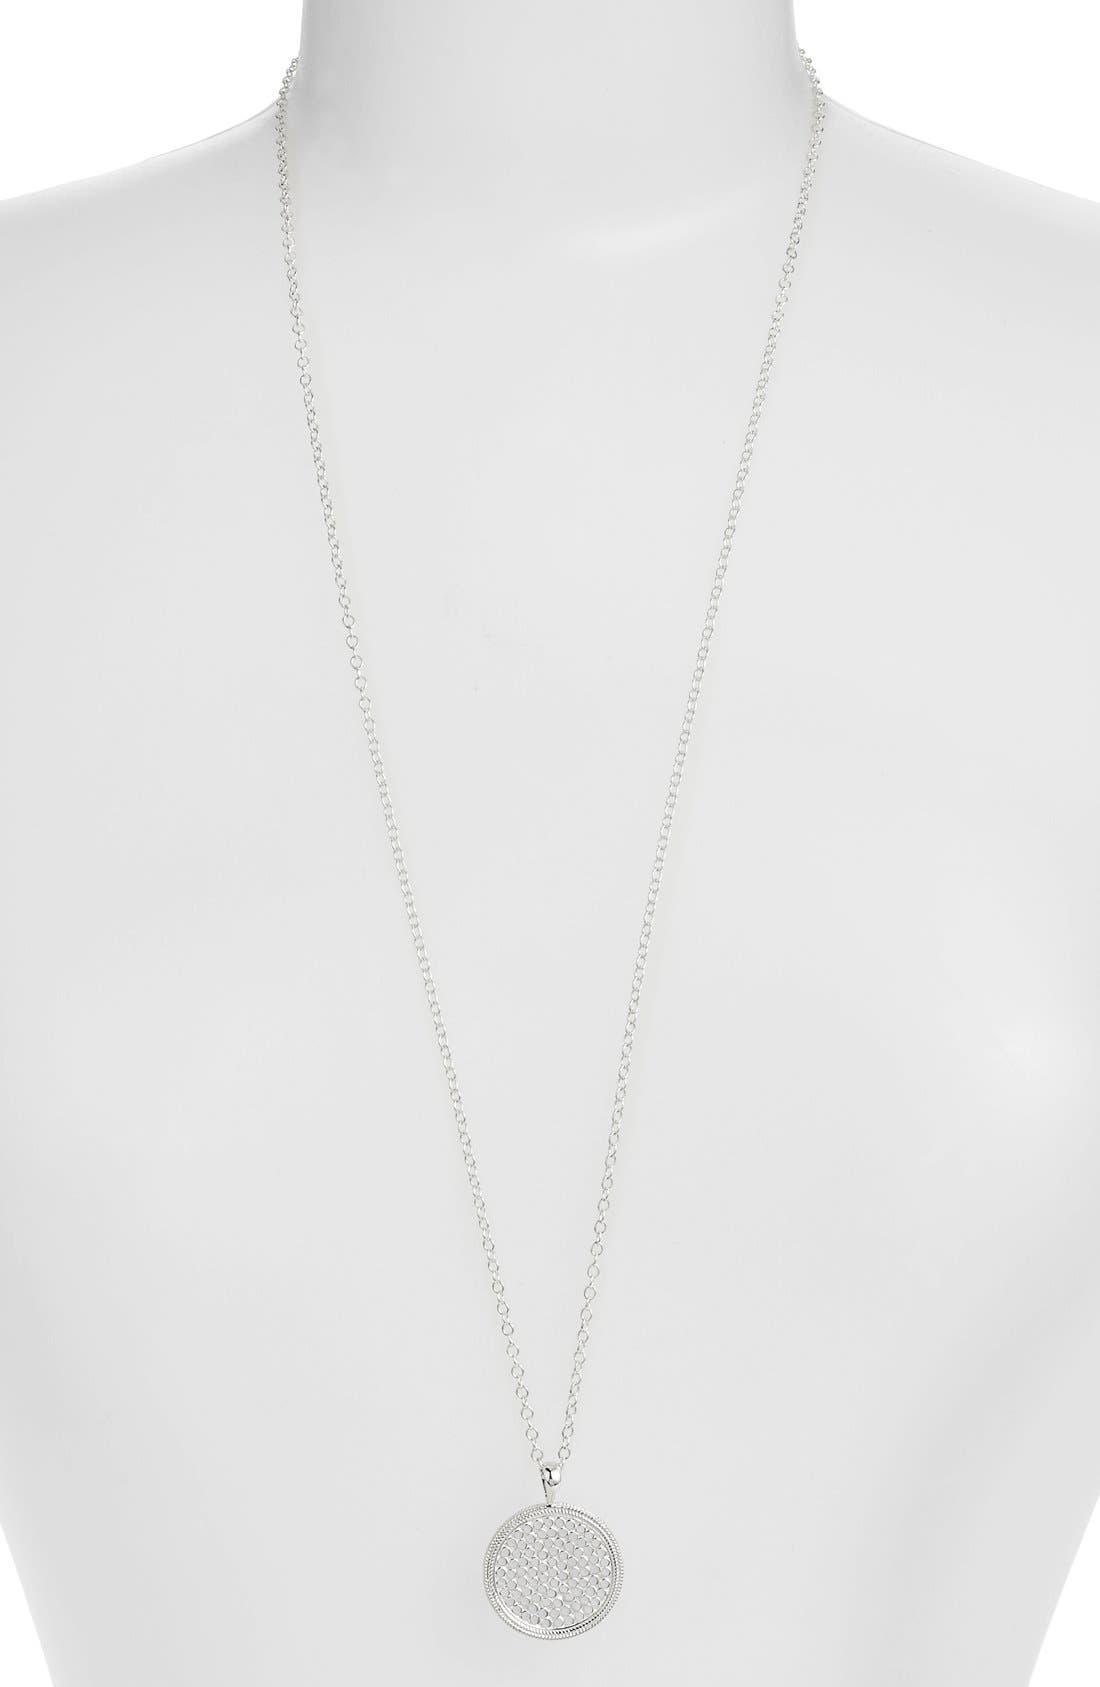 Anna Beck 'Gili' Pendant Necklace